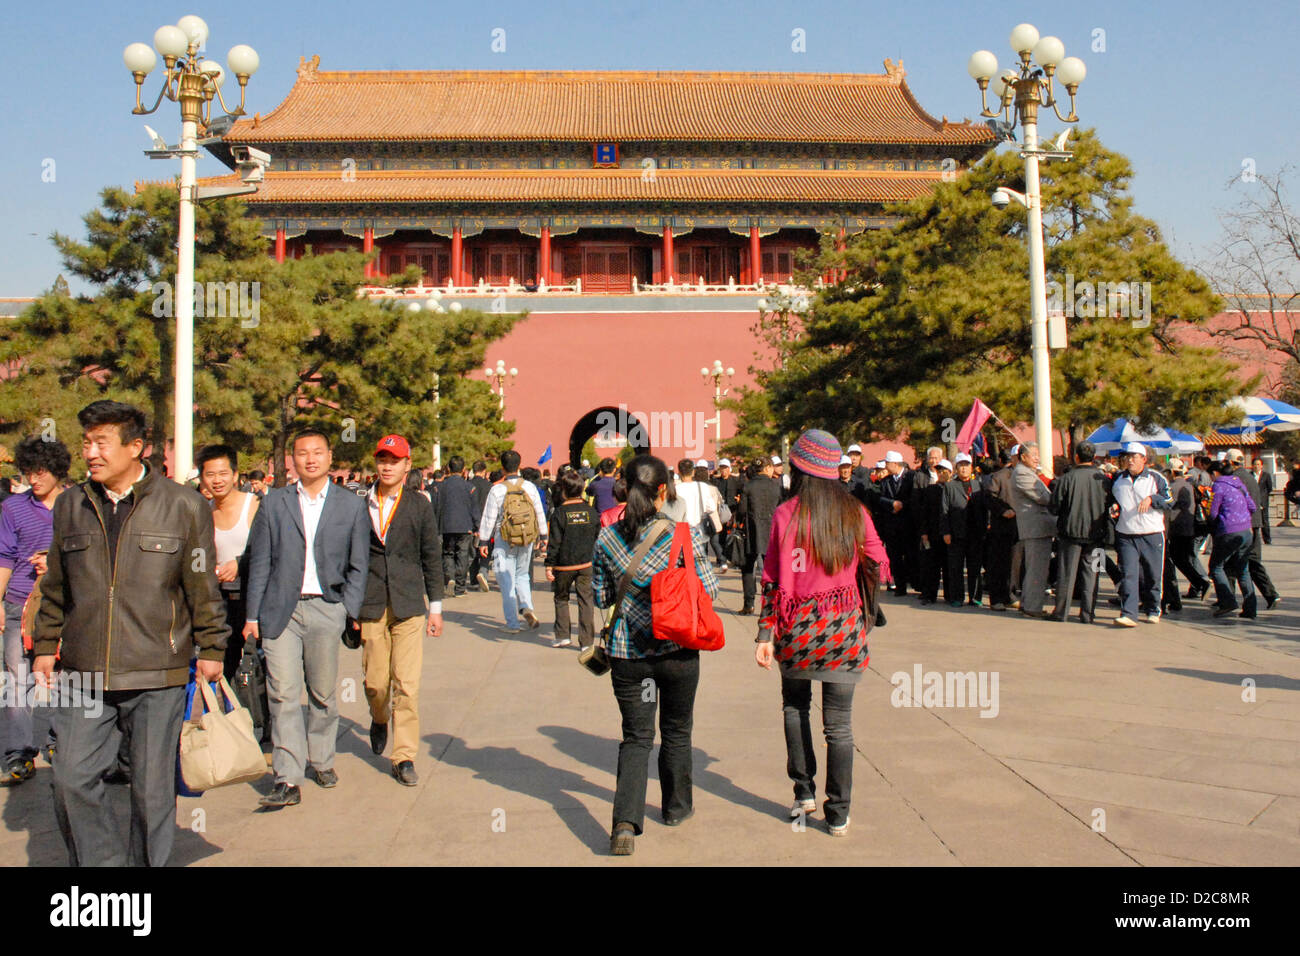 Meridian Gate, Forbidden City, Beijing, China - Stock Image